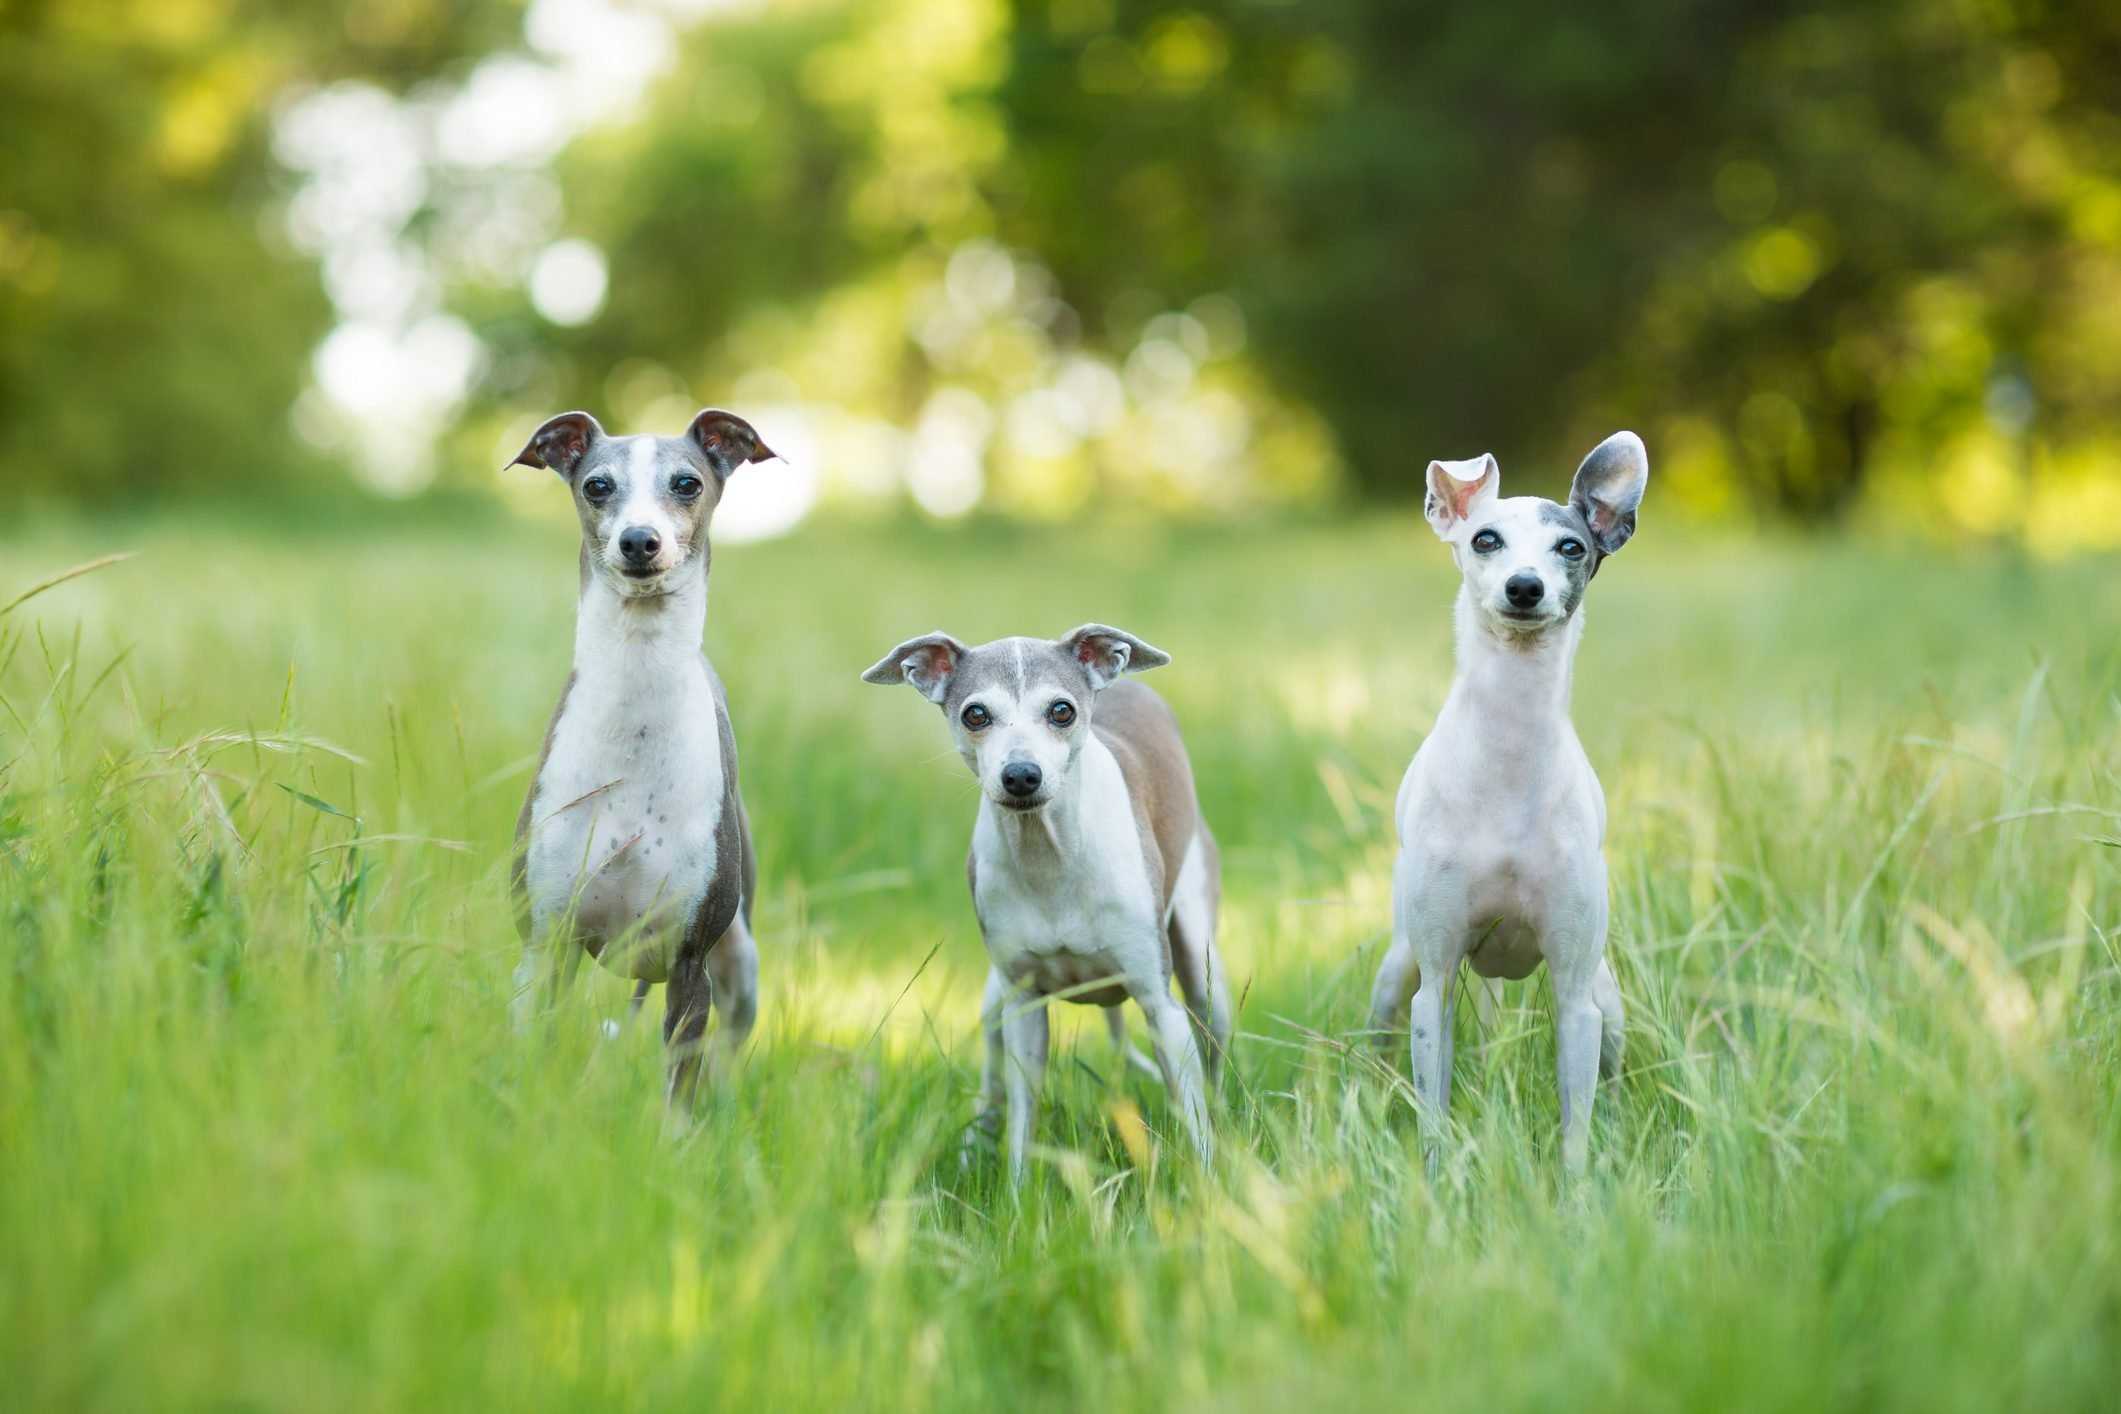 Trio of Curious Italian Greyhound Dogs Outdoors